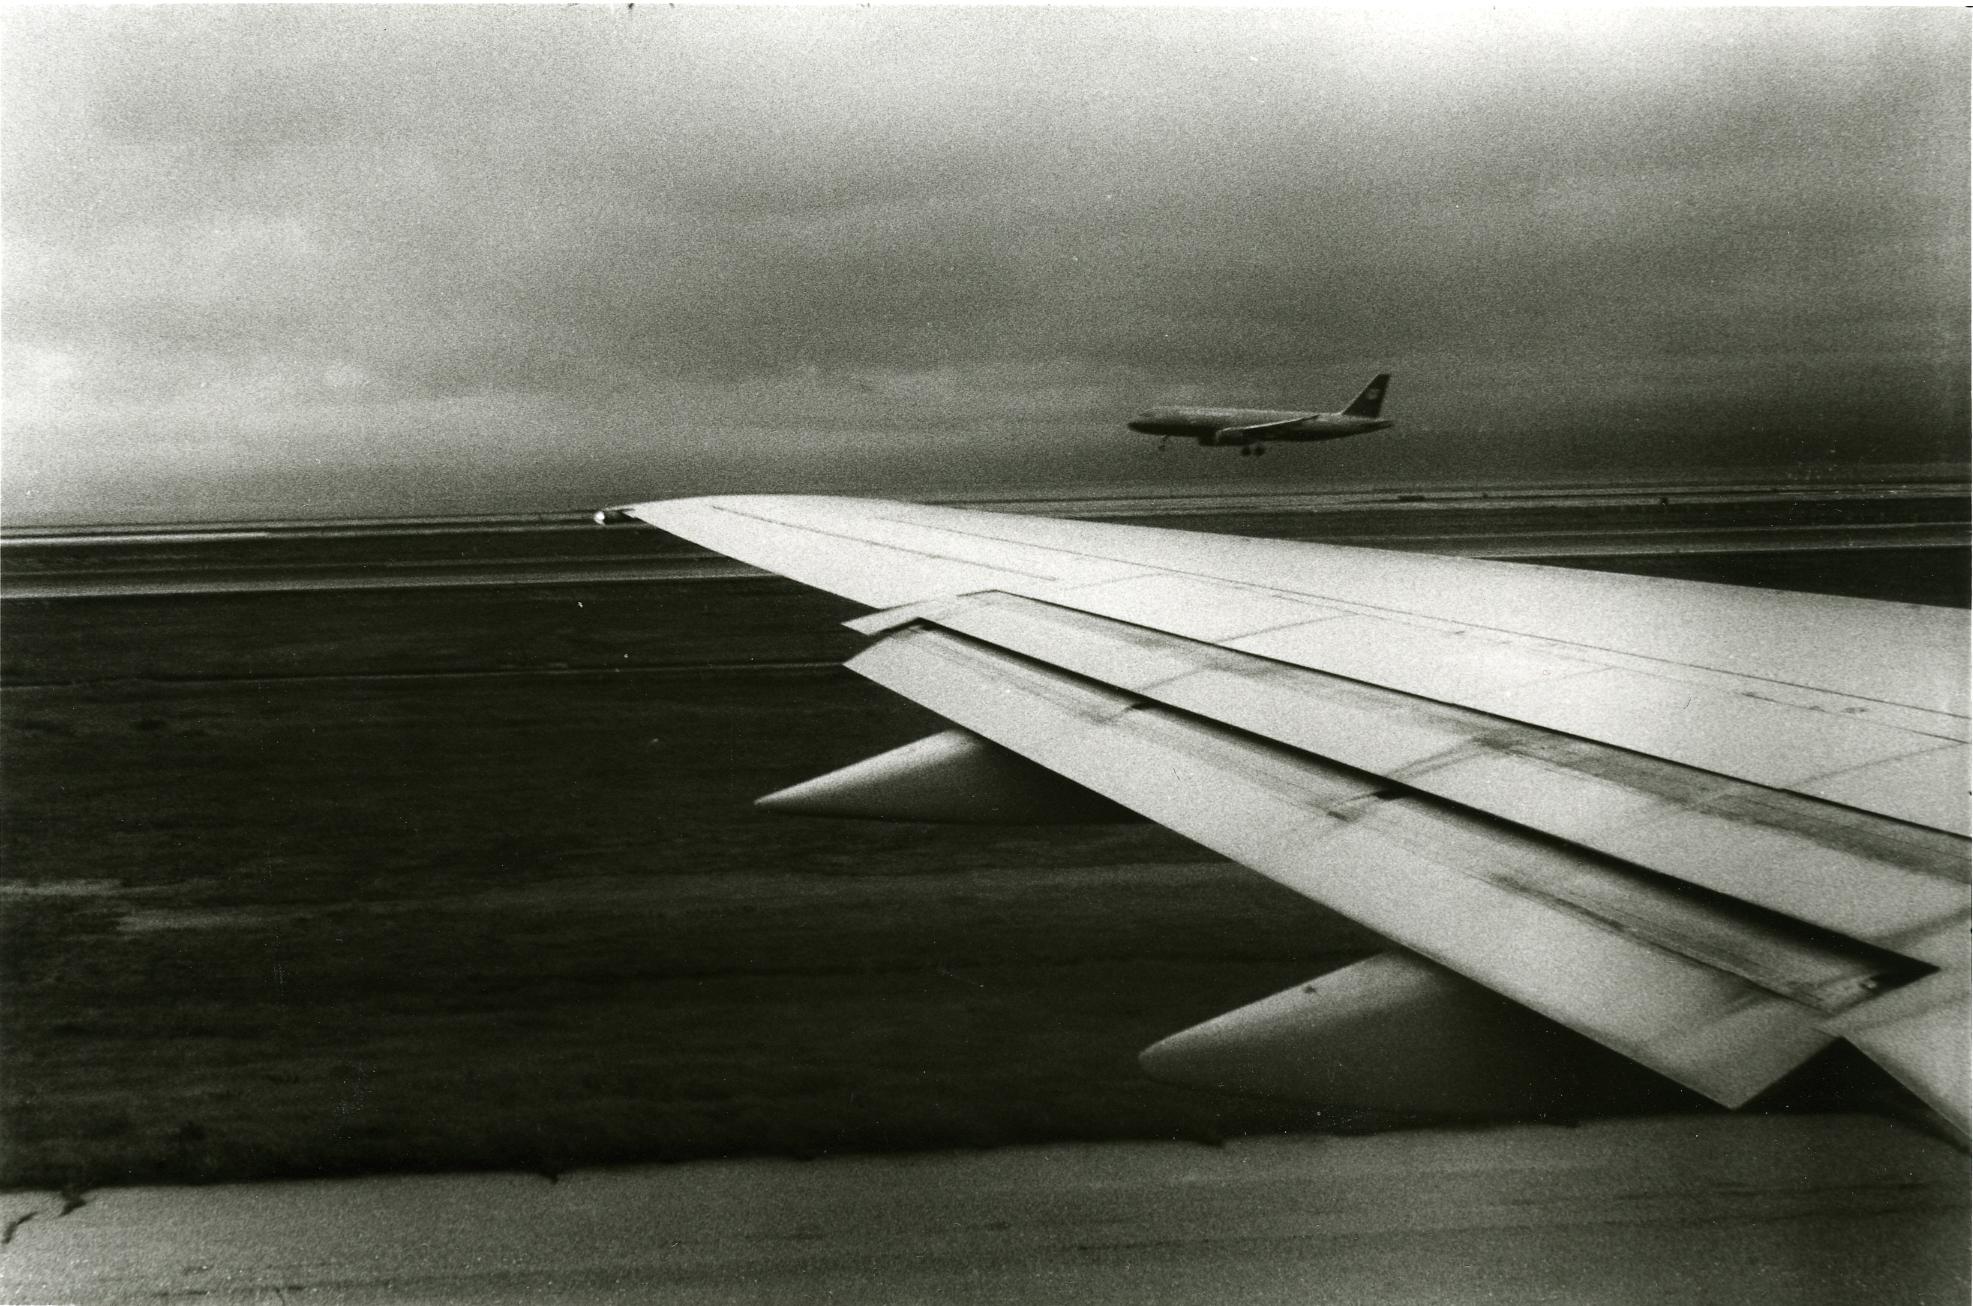 Leaving & Arriving